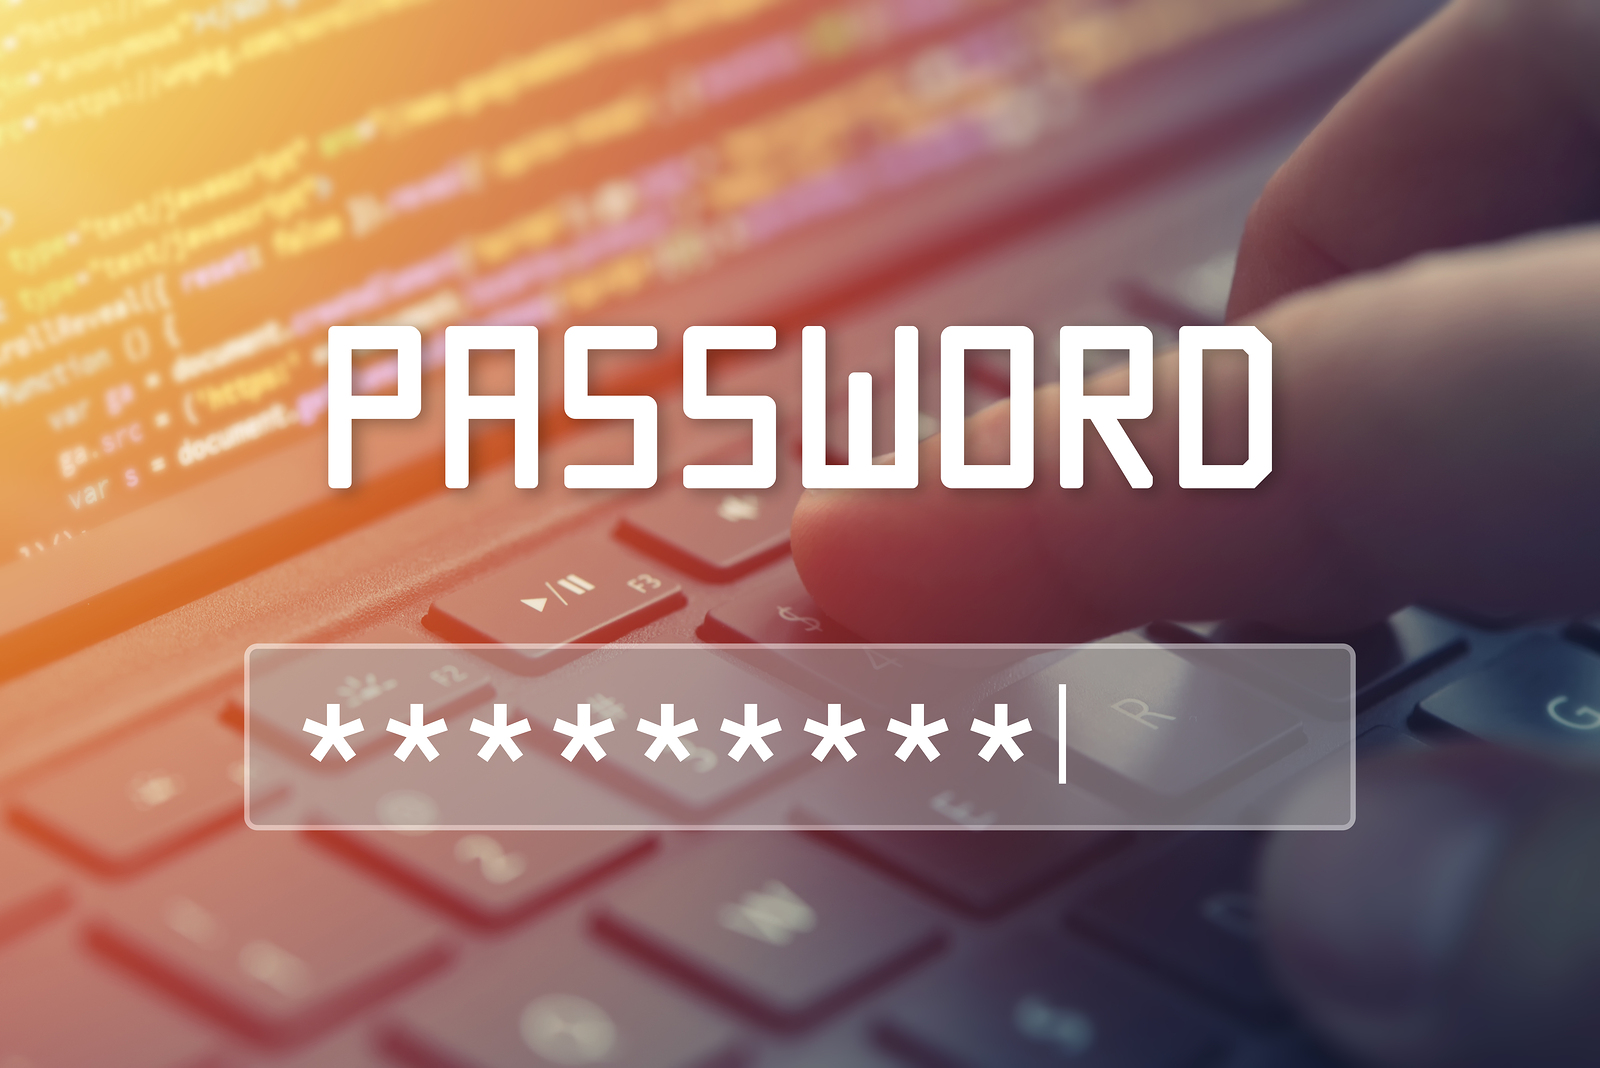 bigstock-Password-Input-On-Blurred-Back-236308780 (1).jpg